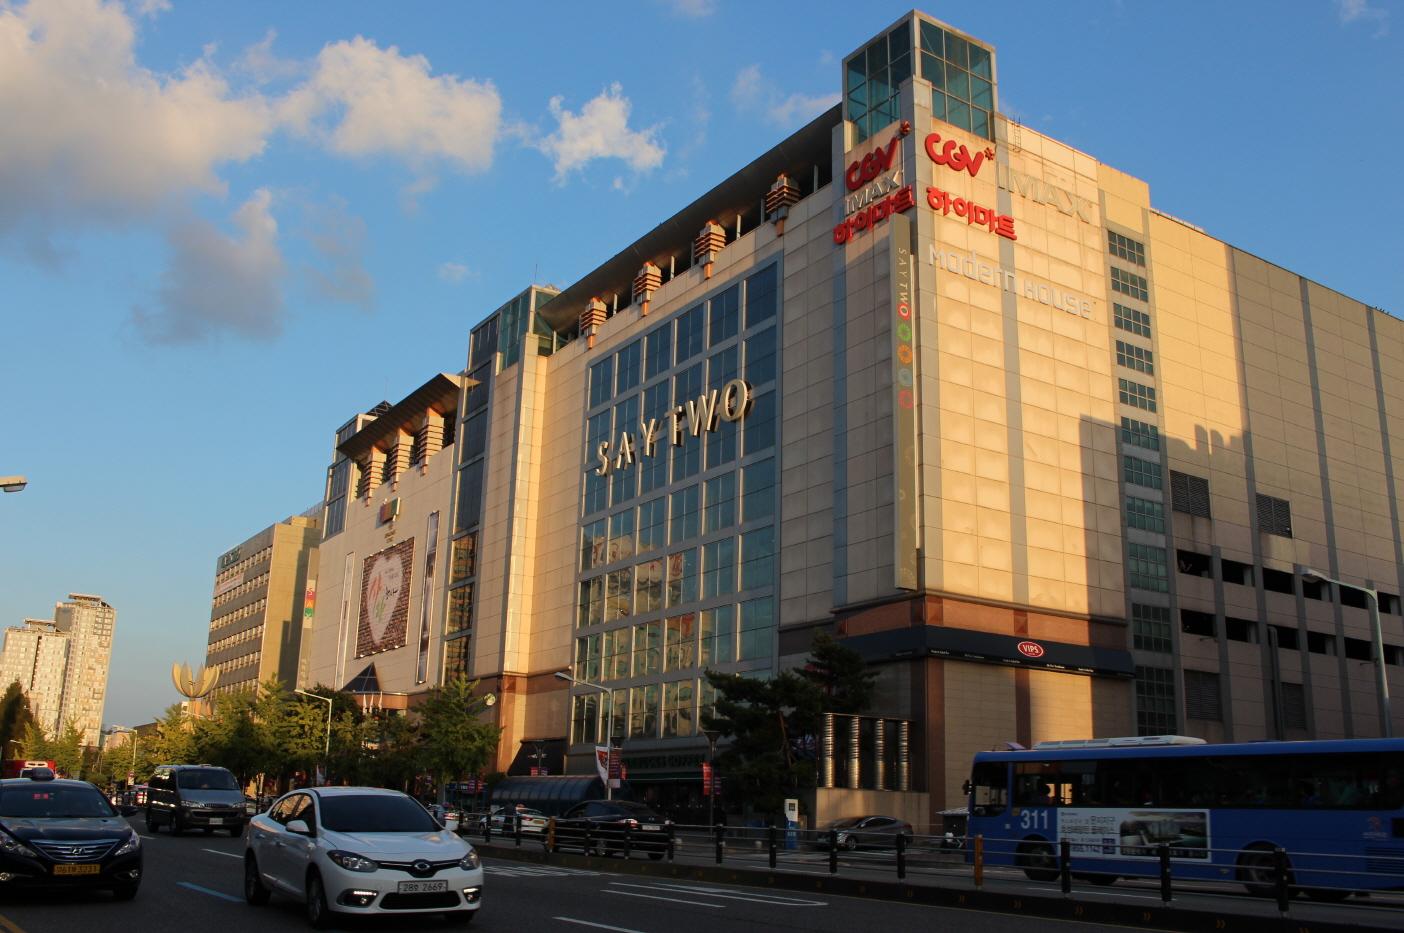 Lotte Hi-mart – Sei Branch (롯데 하이마트 (세이점))